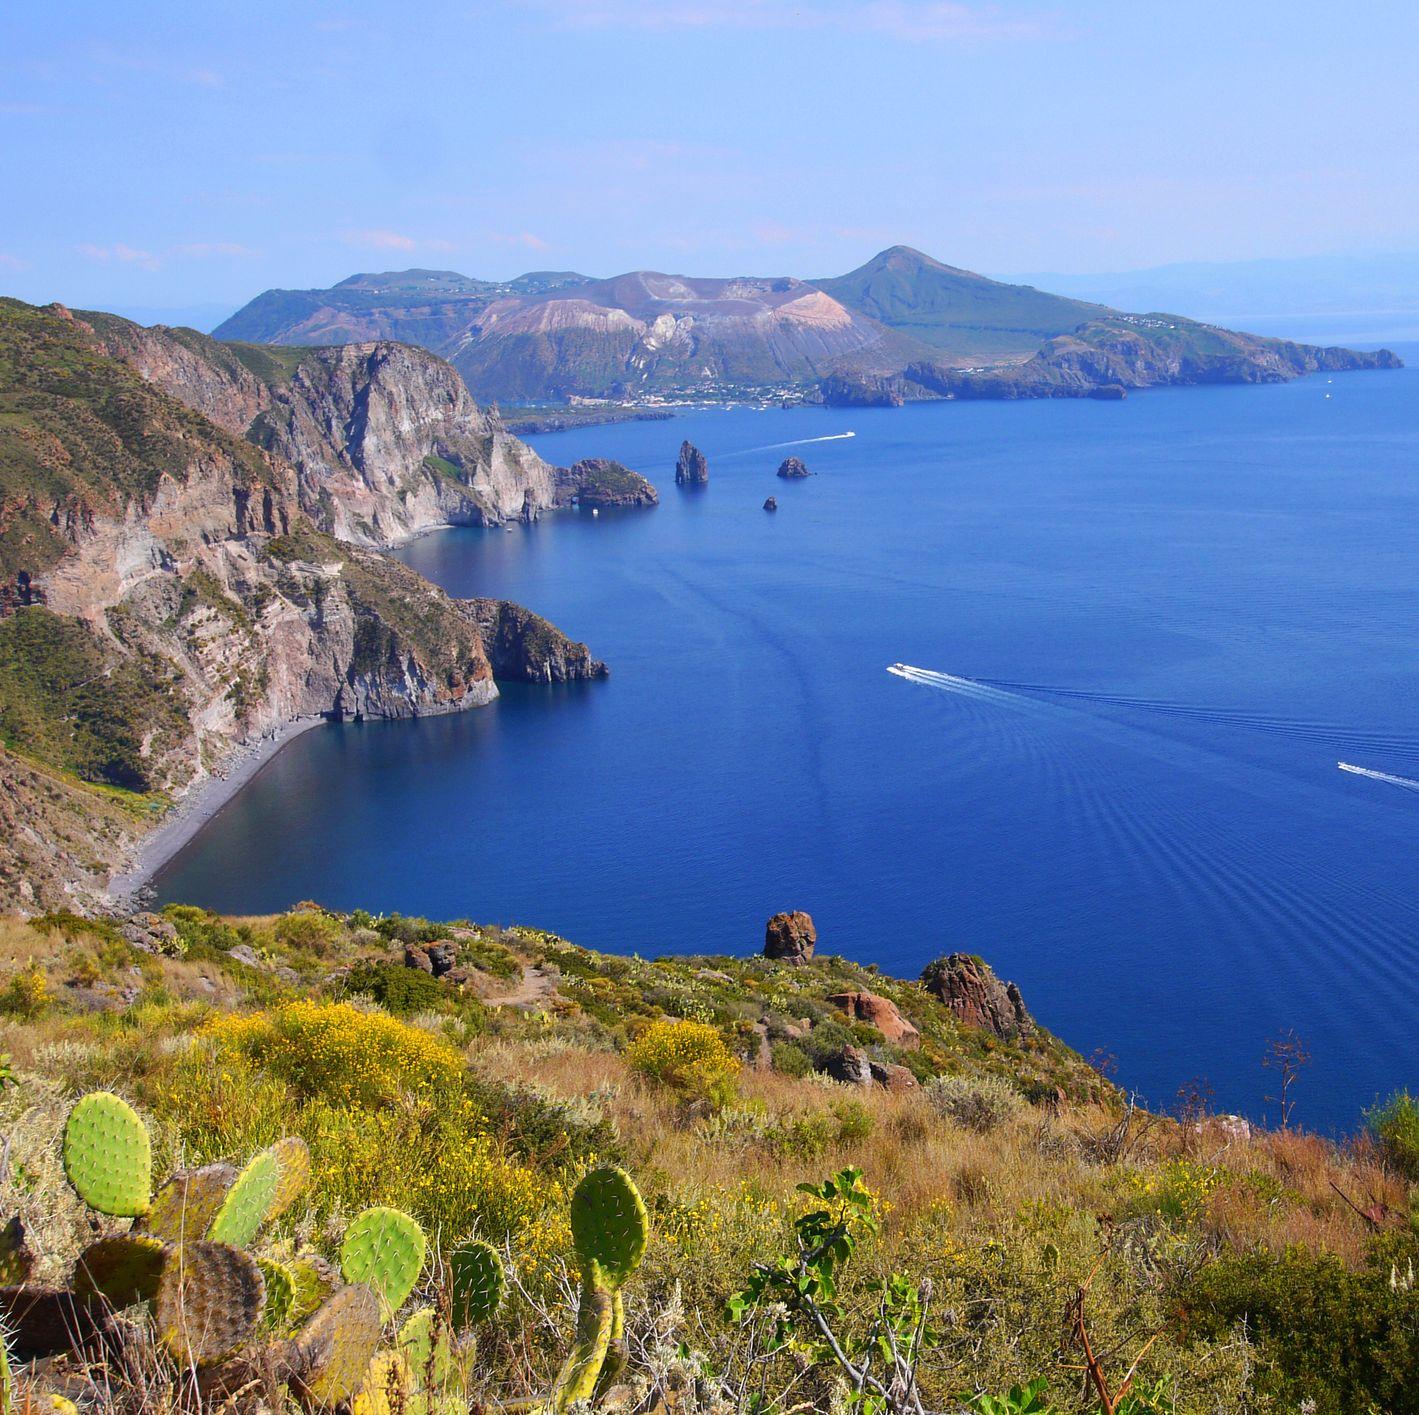 Italy, Sicily, Aeolian Islands, Lipari Island, View from Belvedere Quattrocchi